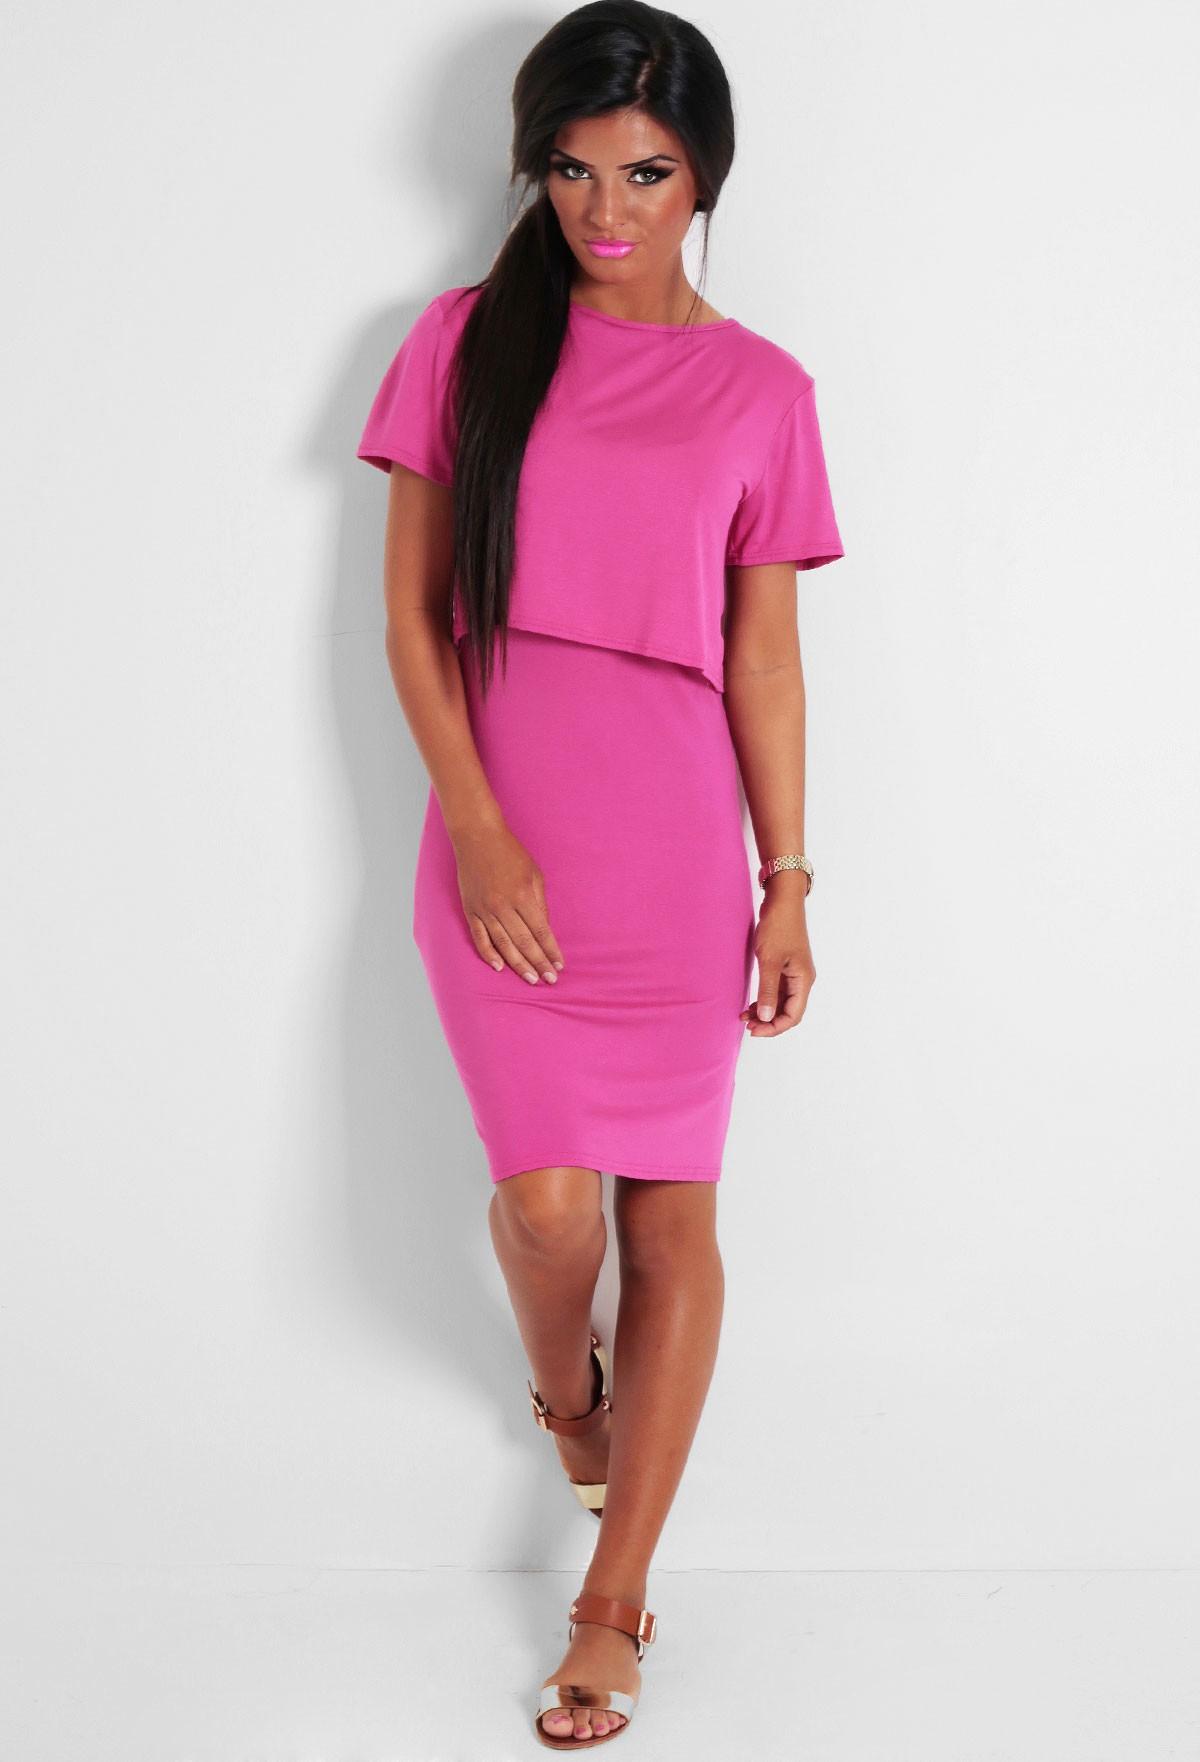 Mysin Pink Layered T-Shirt Style Dress | Pink Boutique